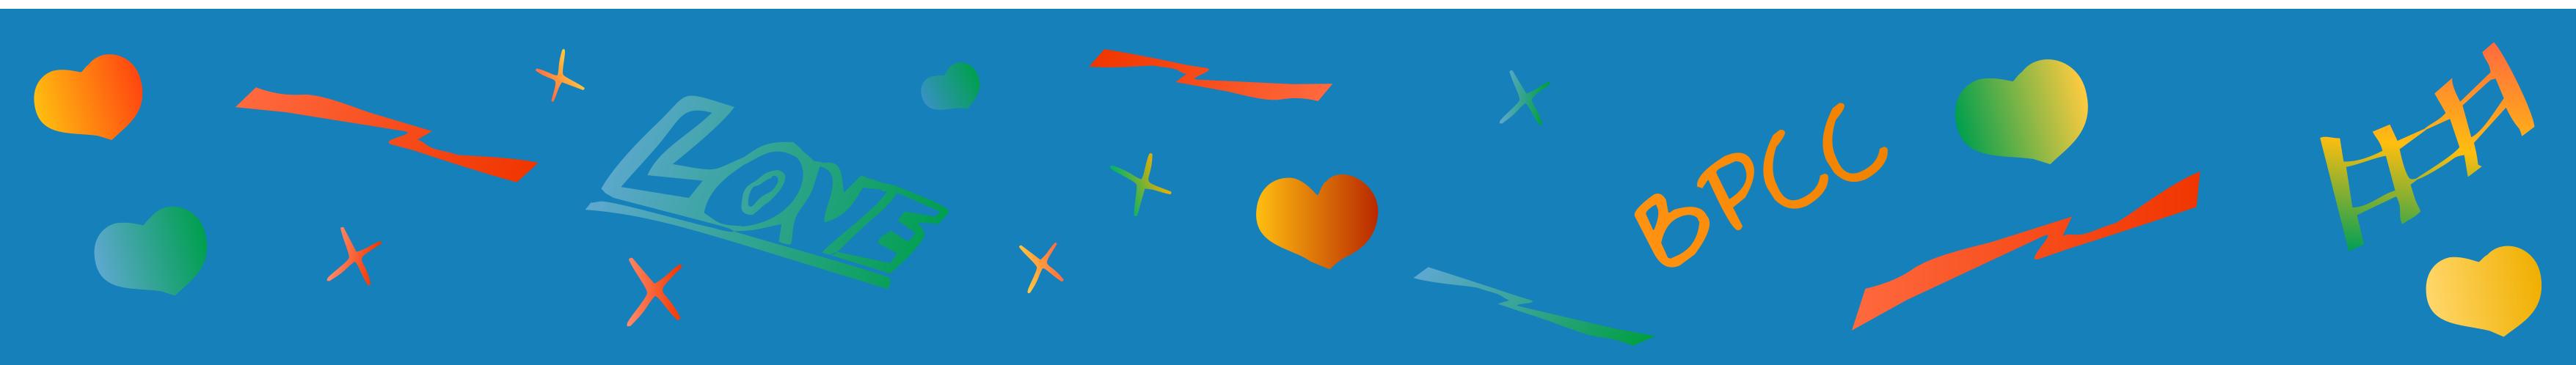 BPCC logo variation